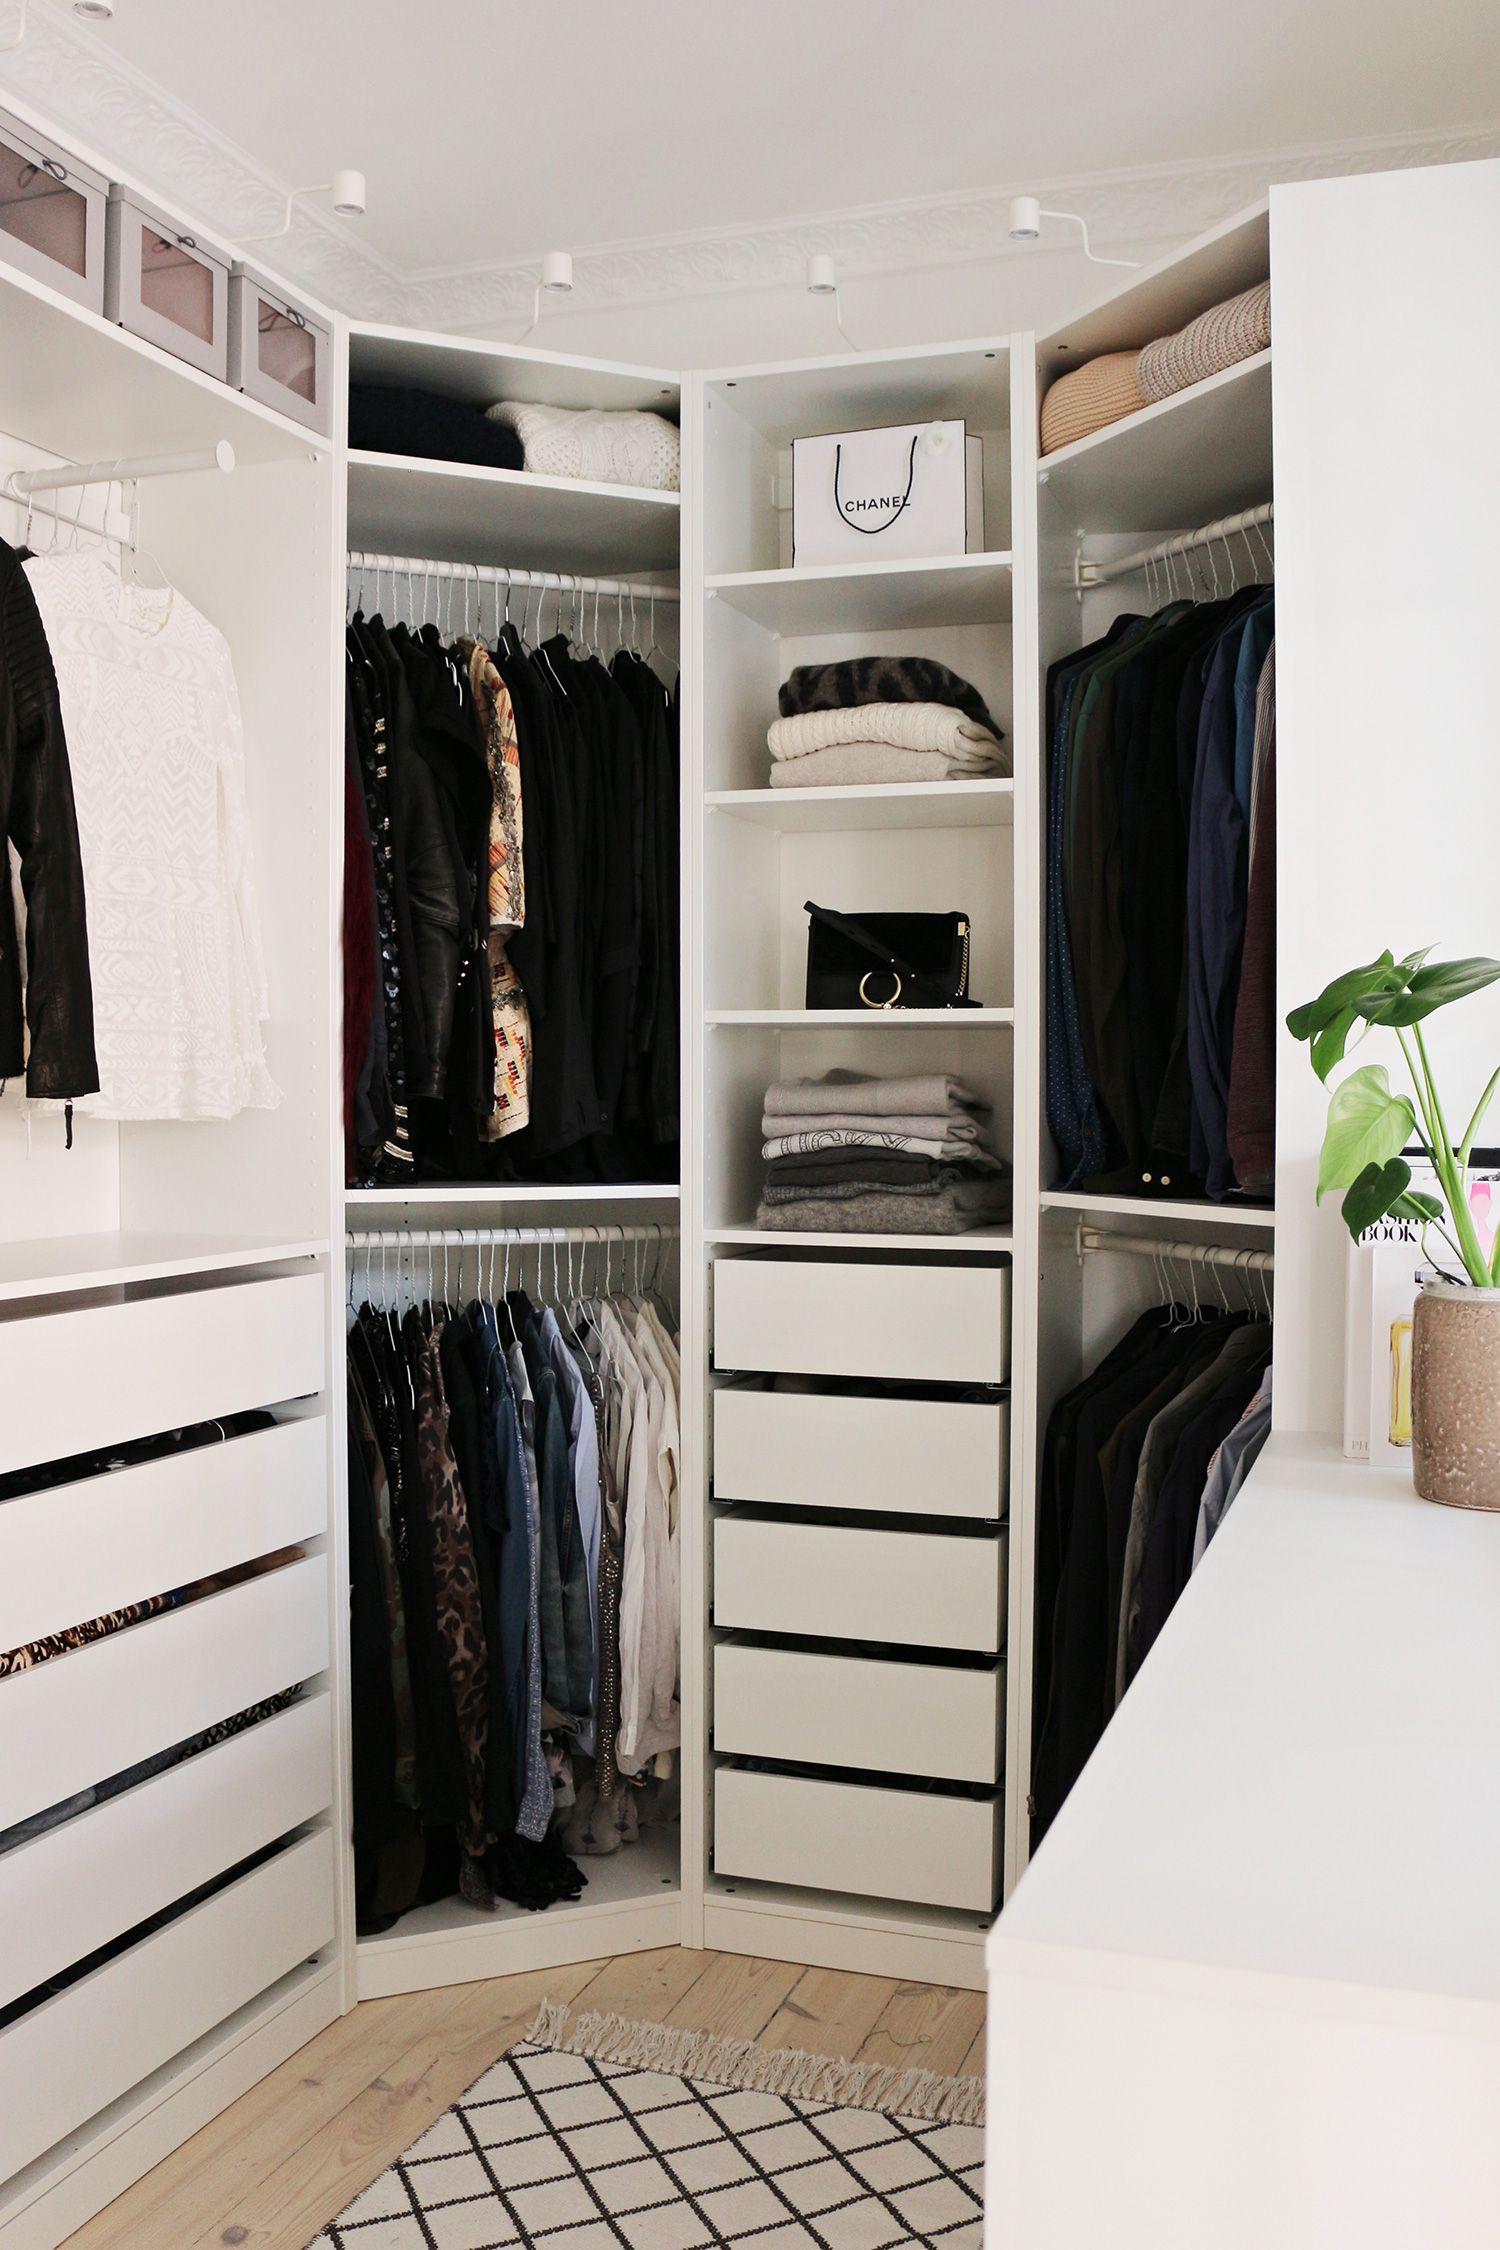 Inloopkast Van Fashionista Christina Uit Kopenhagen Ikea Pax